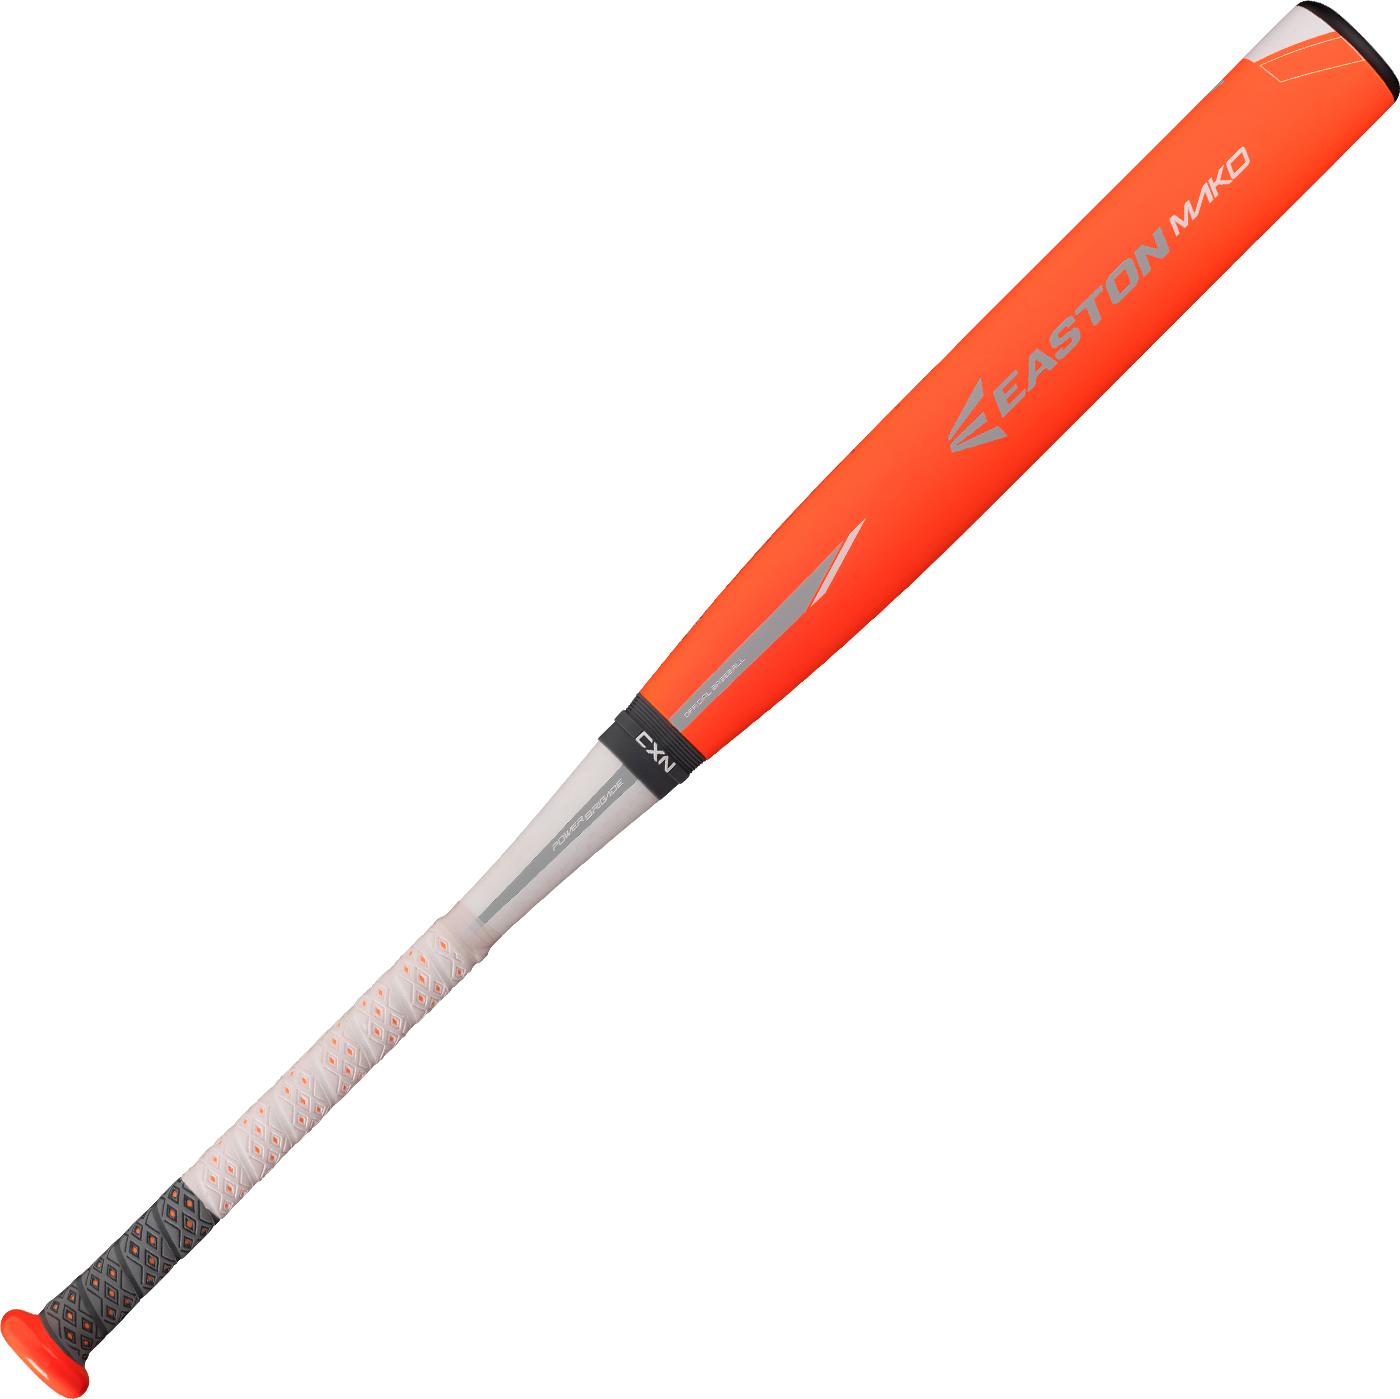 1400x1399 Baseball Bat Clipart Softball Game